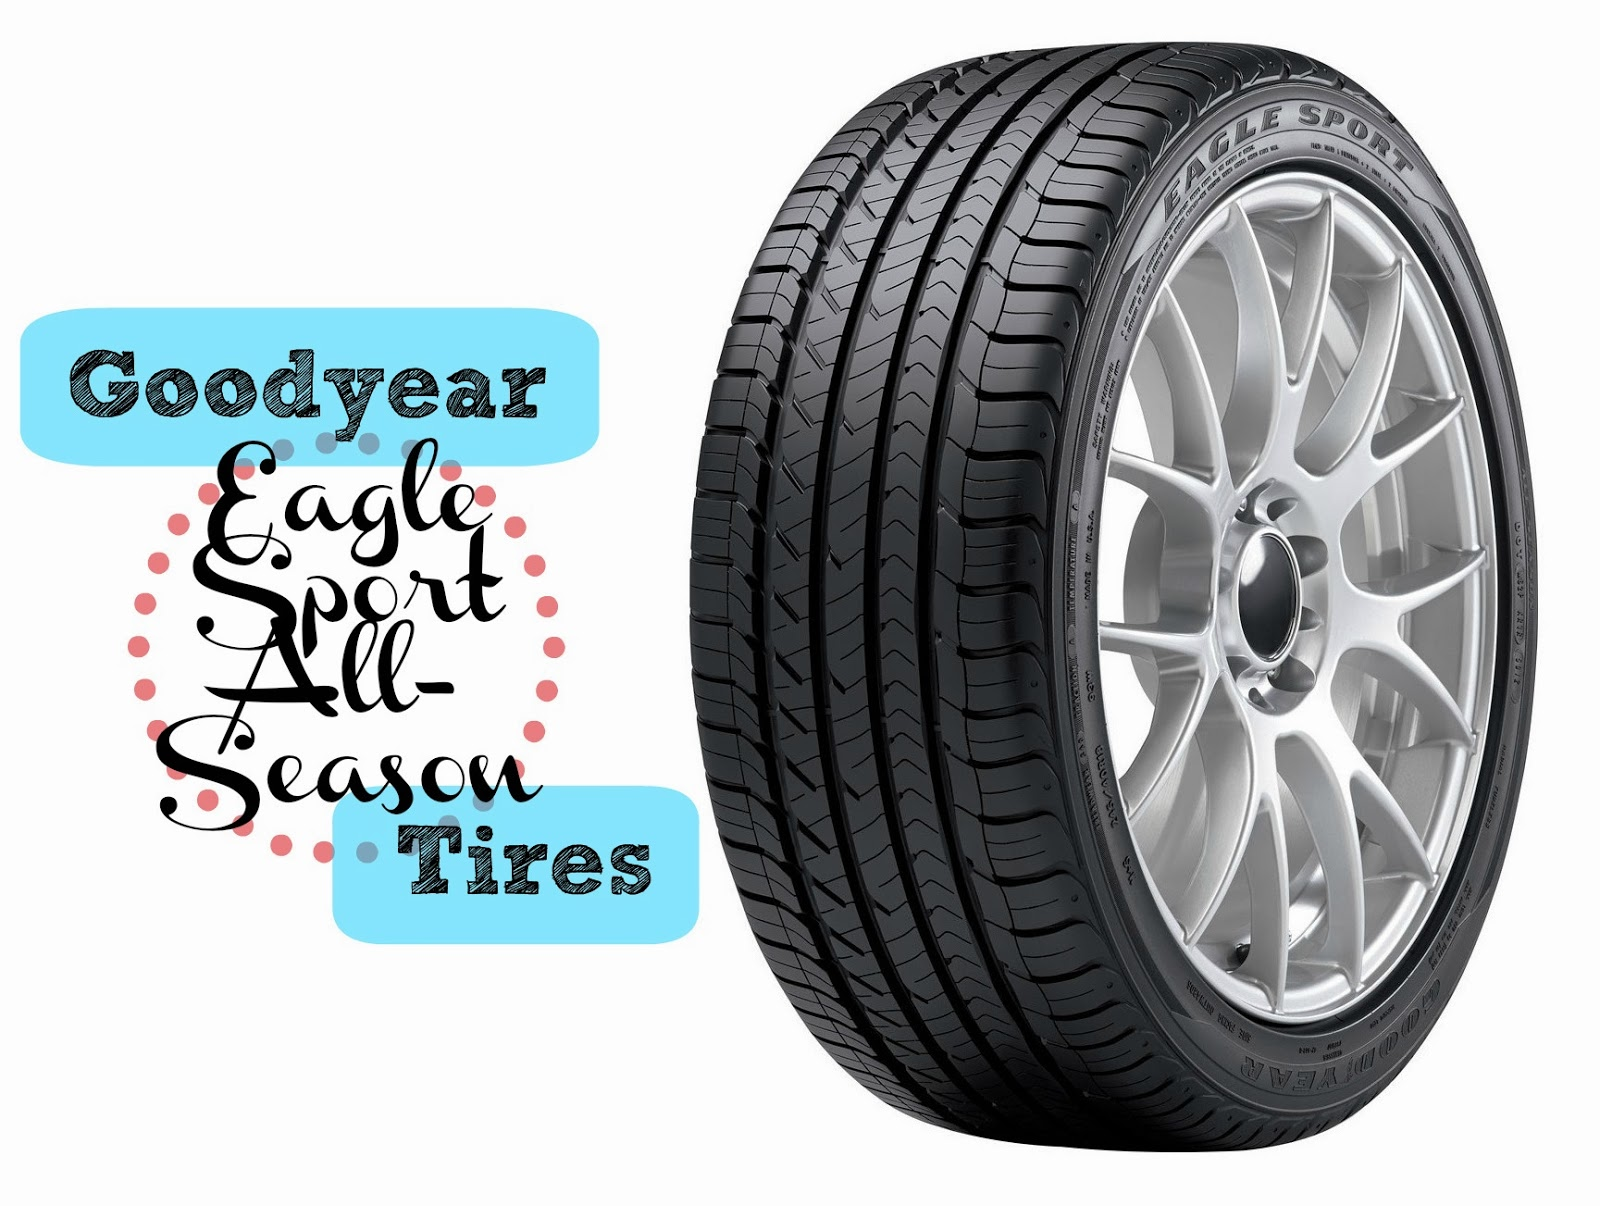 Goodyear Eagle Sport All-Season Tires